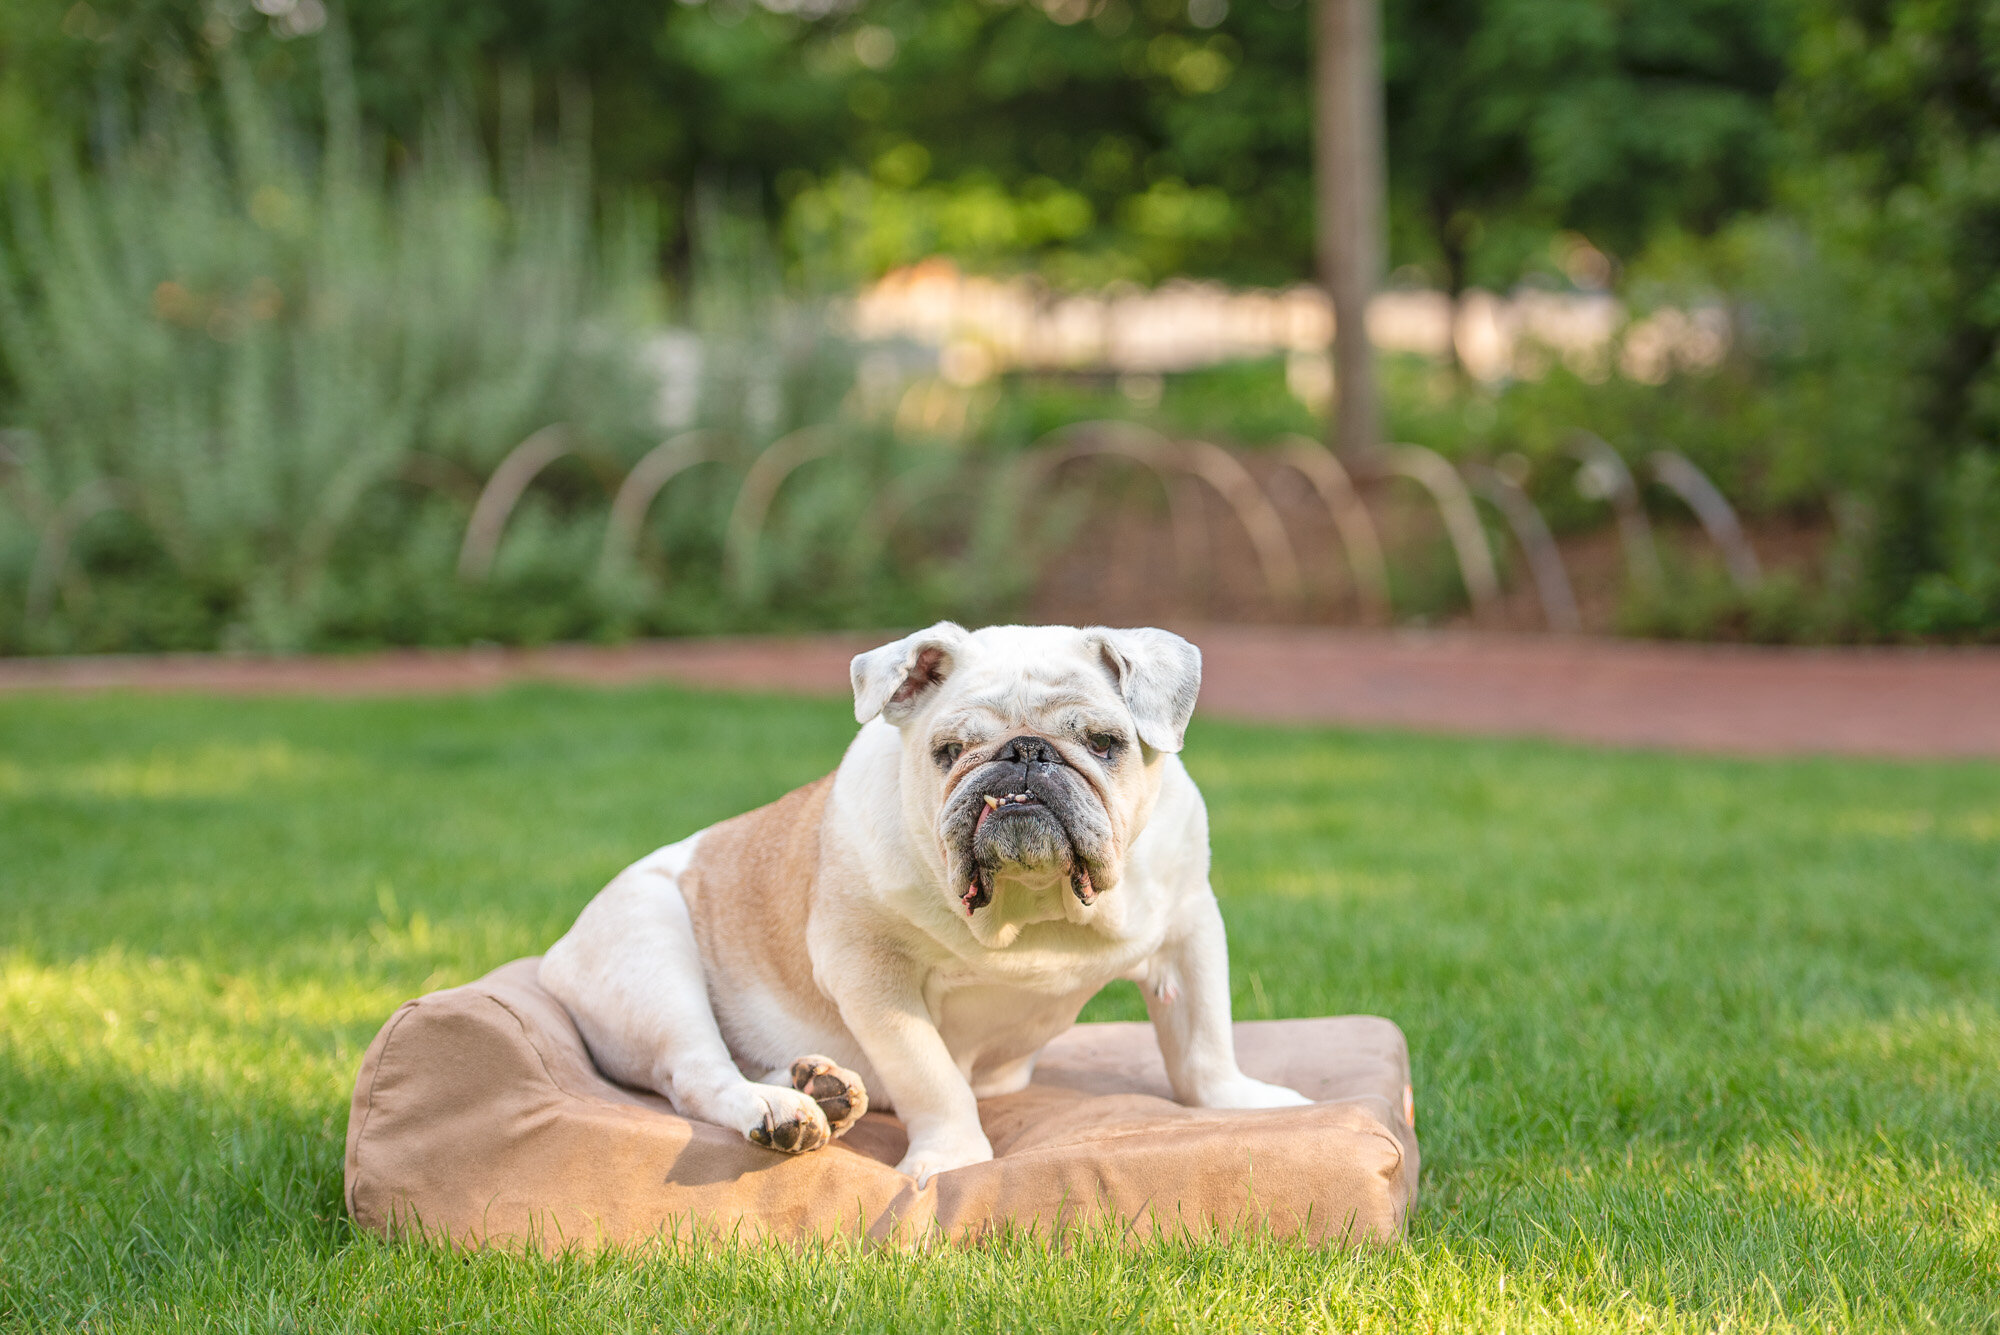 senior english bulldog photo Romare Bearden Park